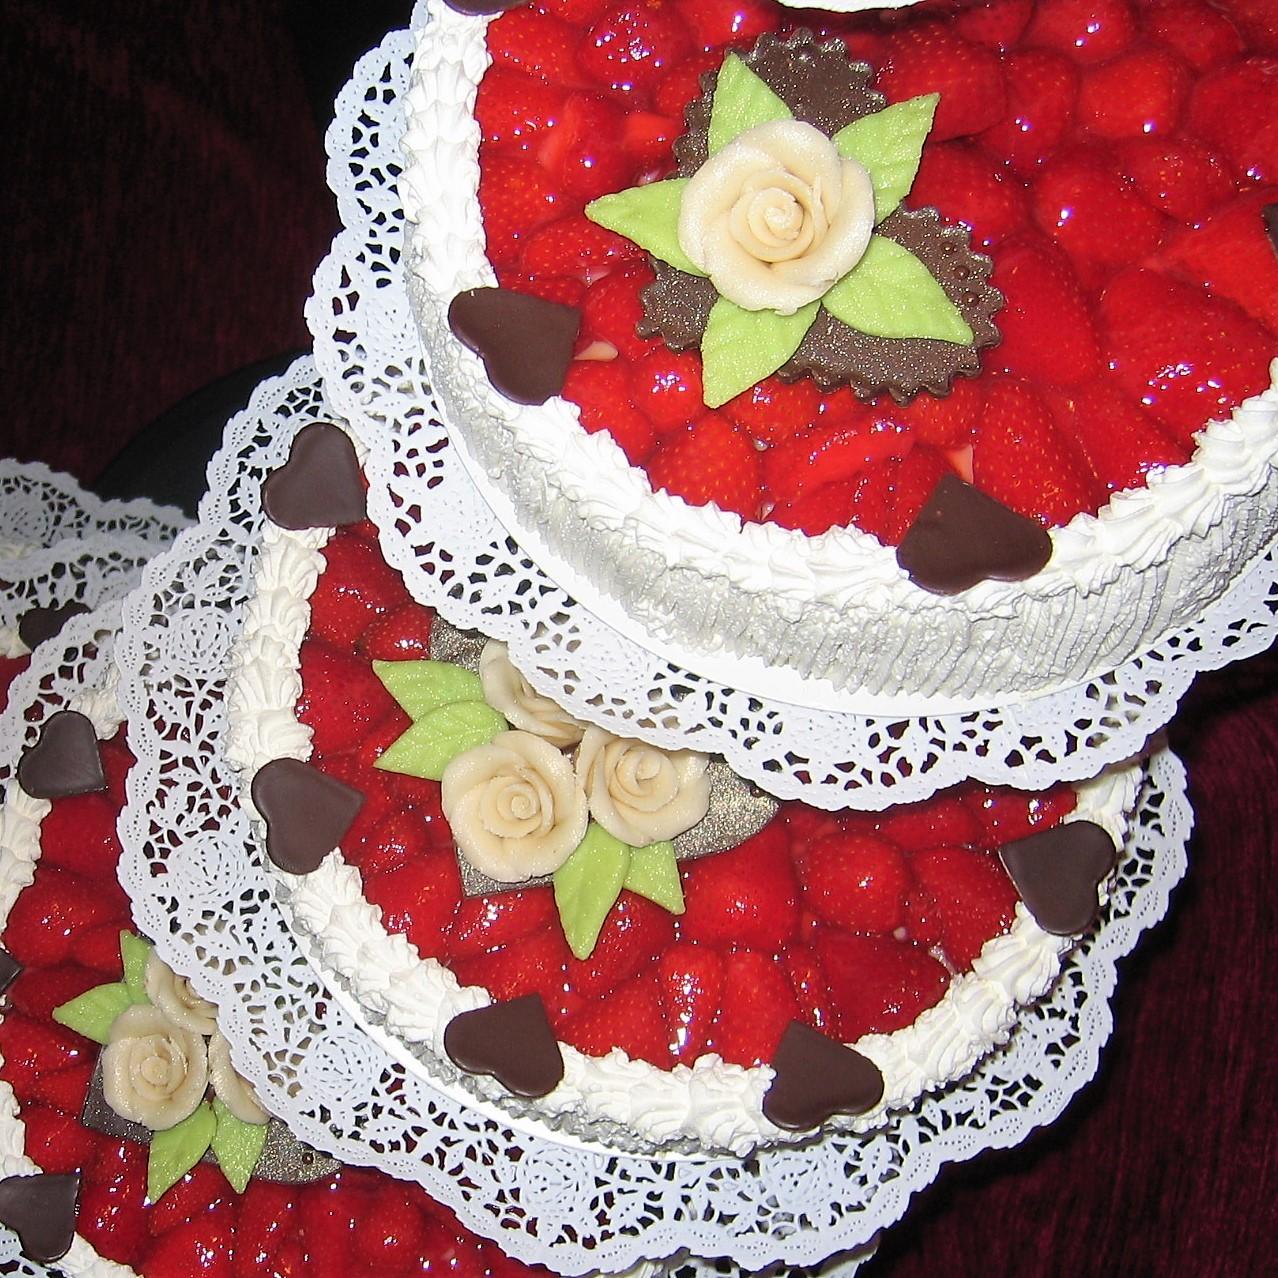 Erdbeer Hochzeitstorte Backerei Confiserie Koch Ag